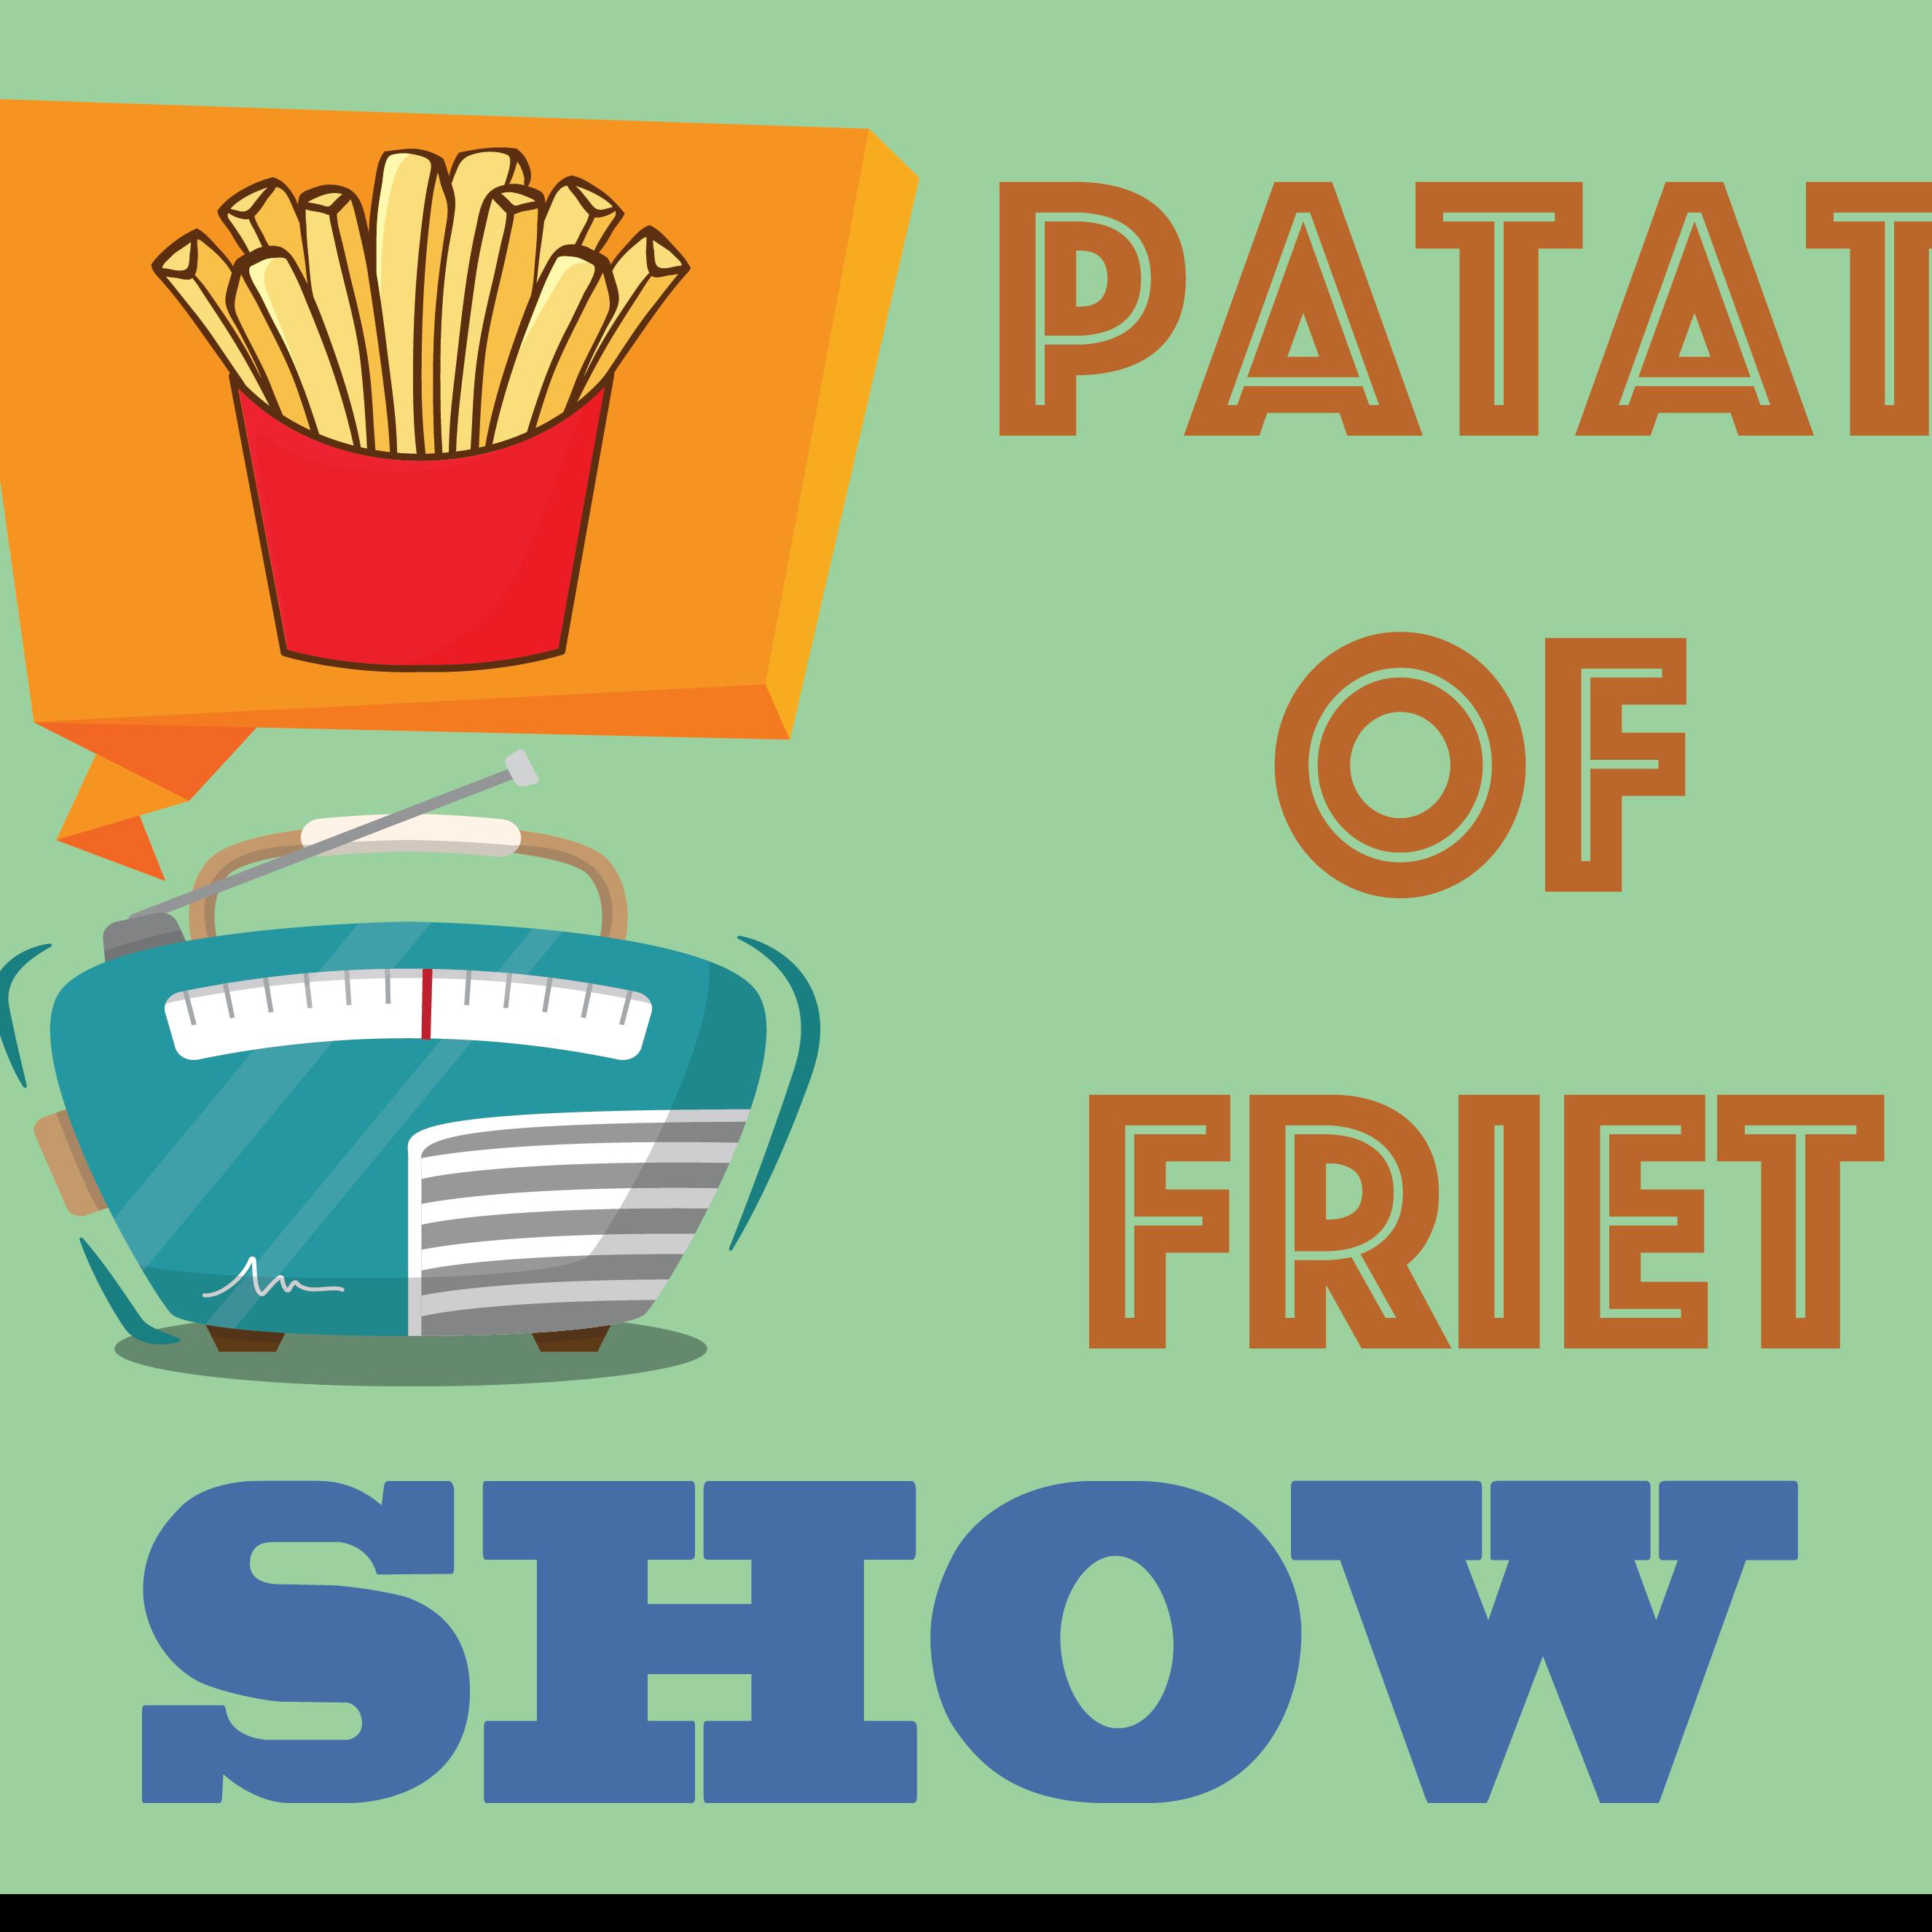 Patat of Friet Show